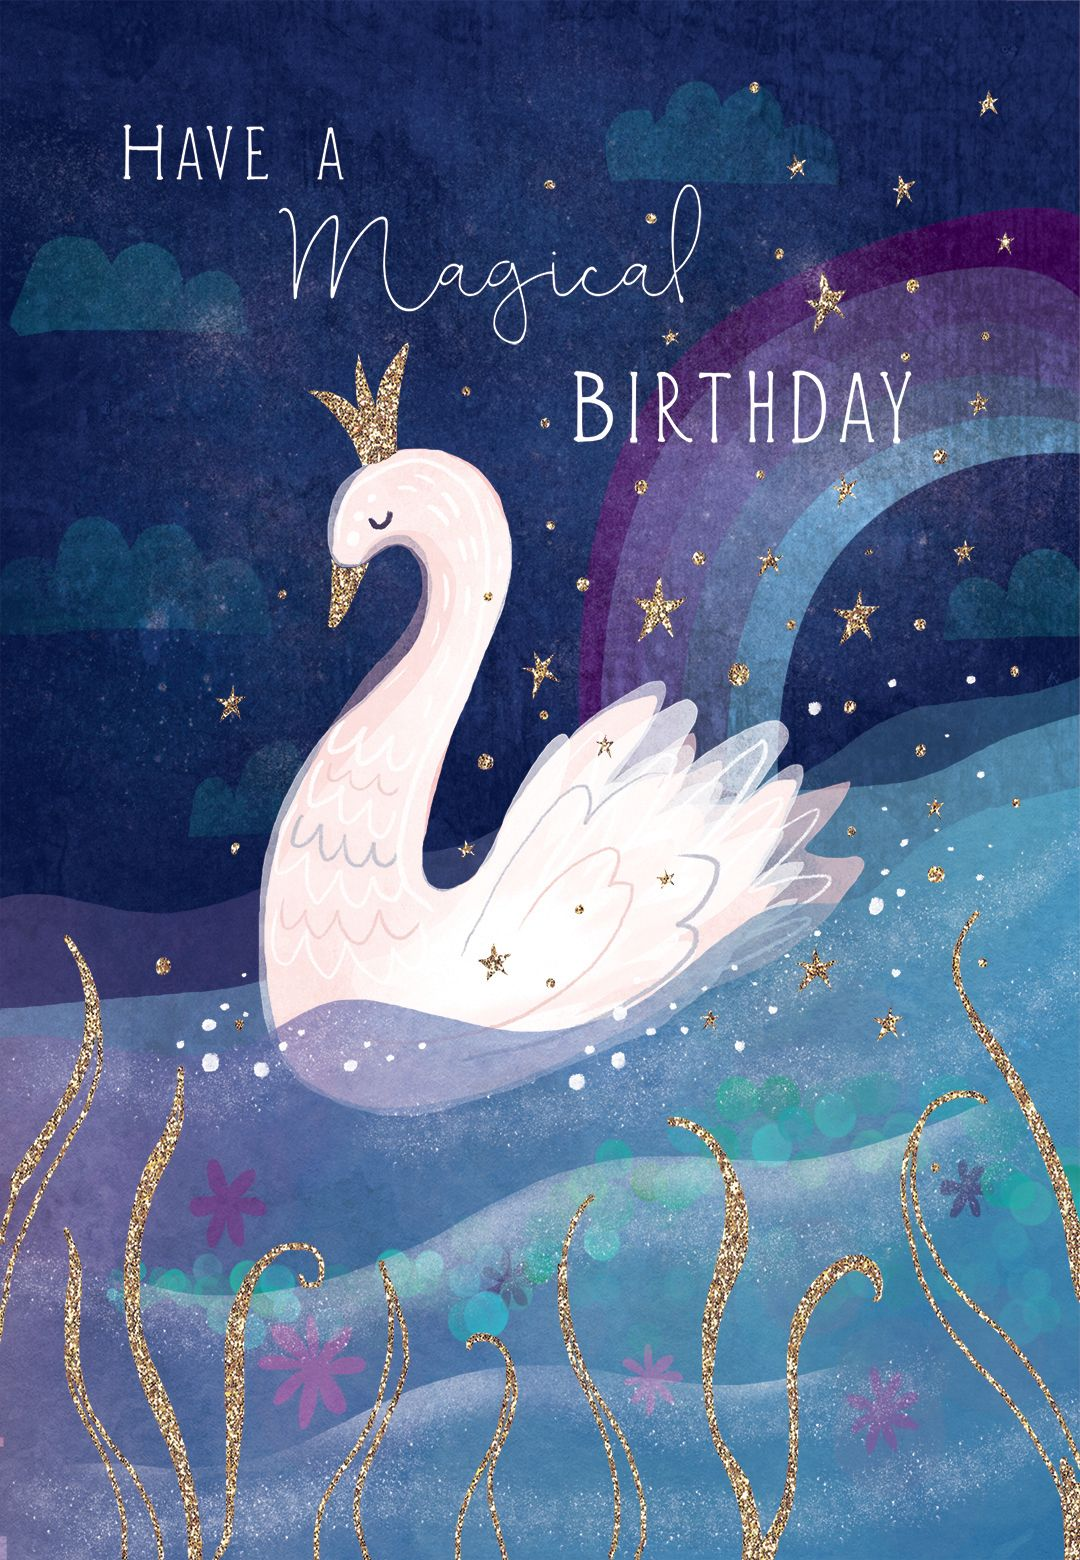 royal swan  birthday card free  greetings island in